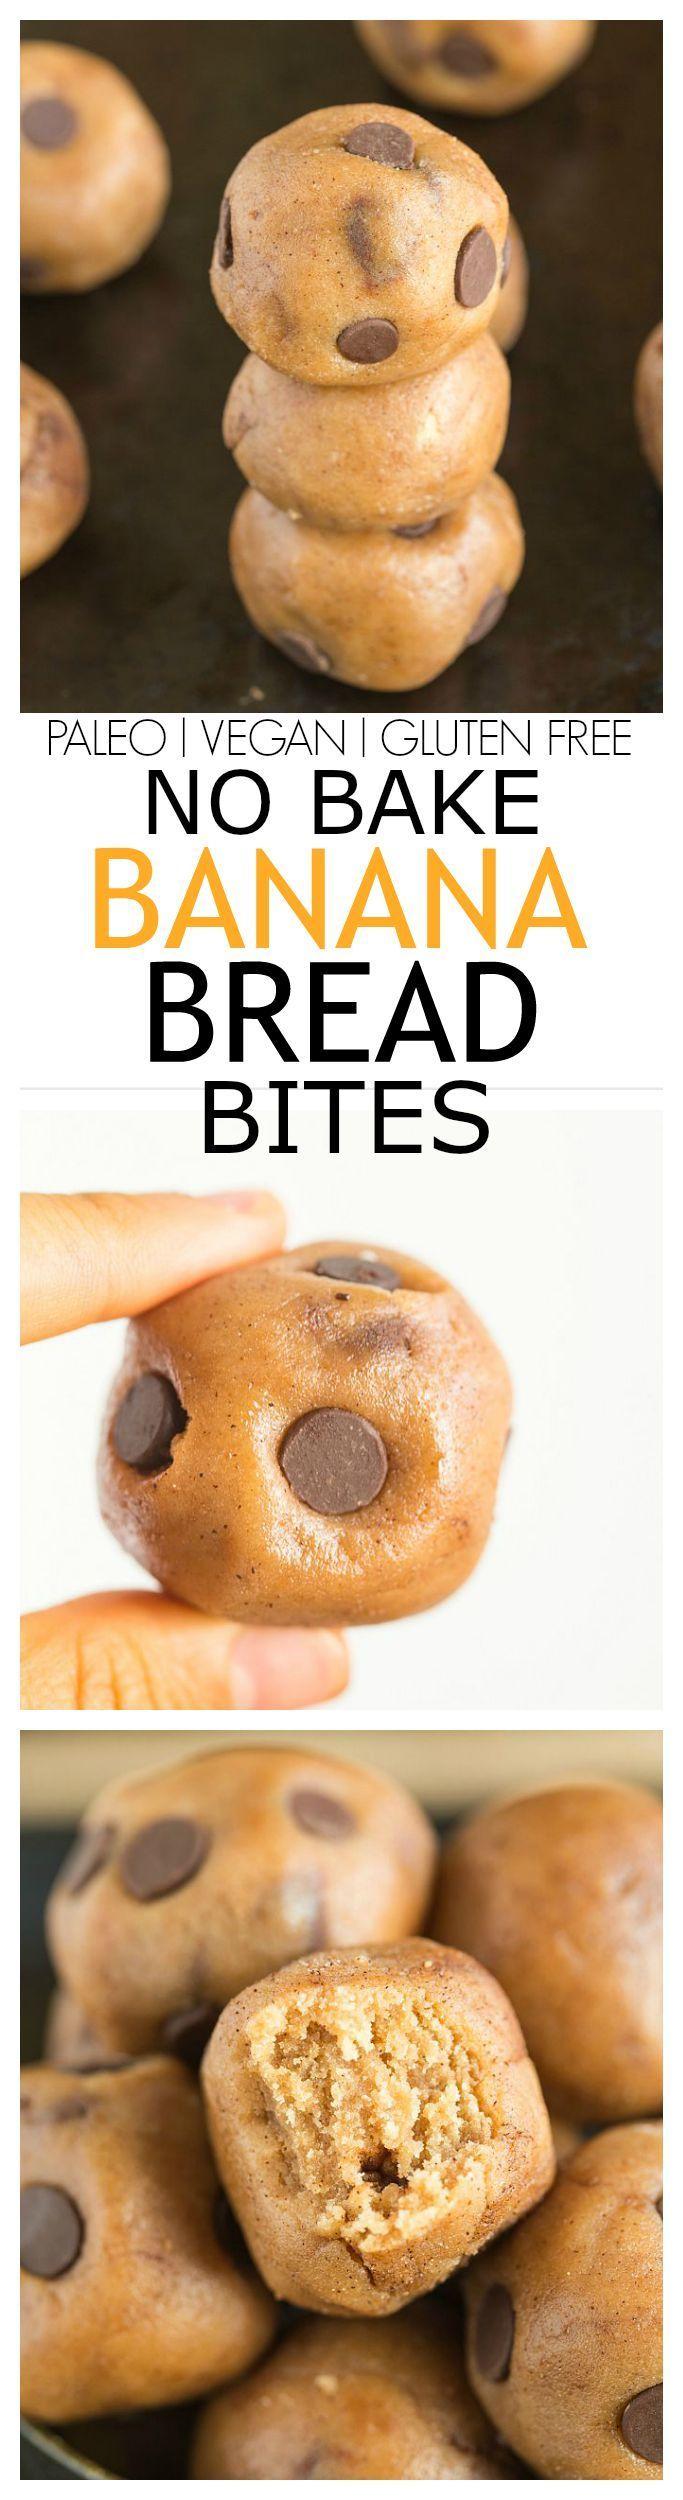 No Bake Banana Bread Bites-